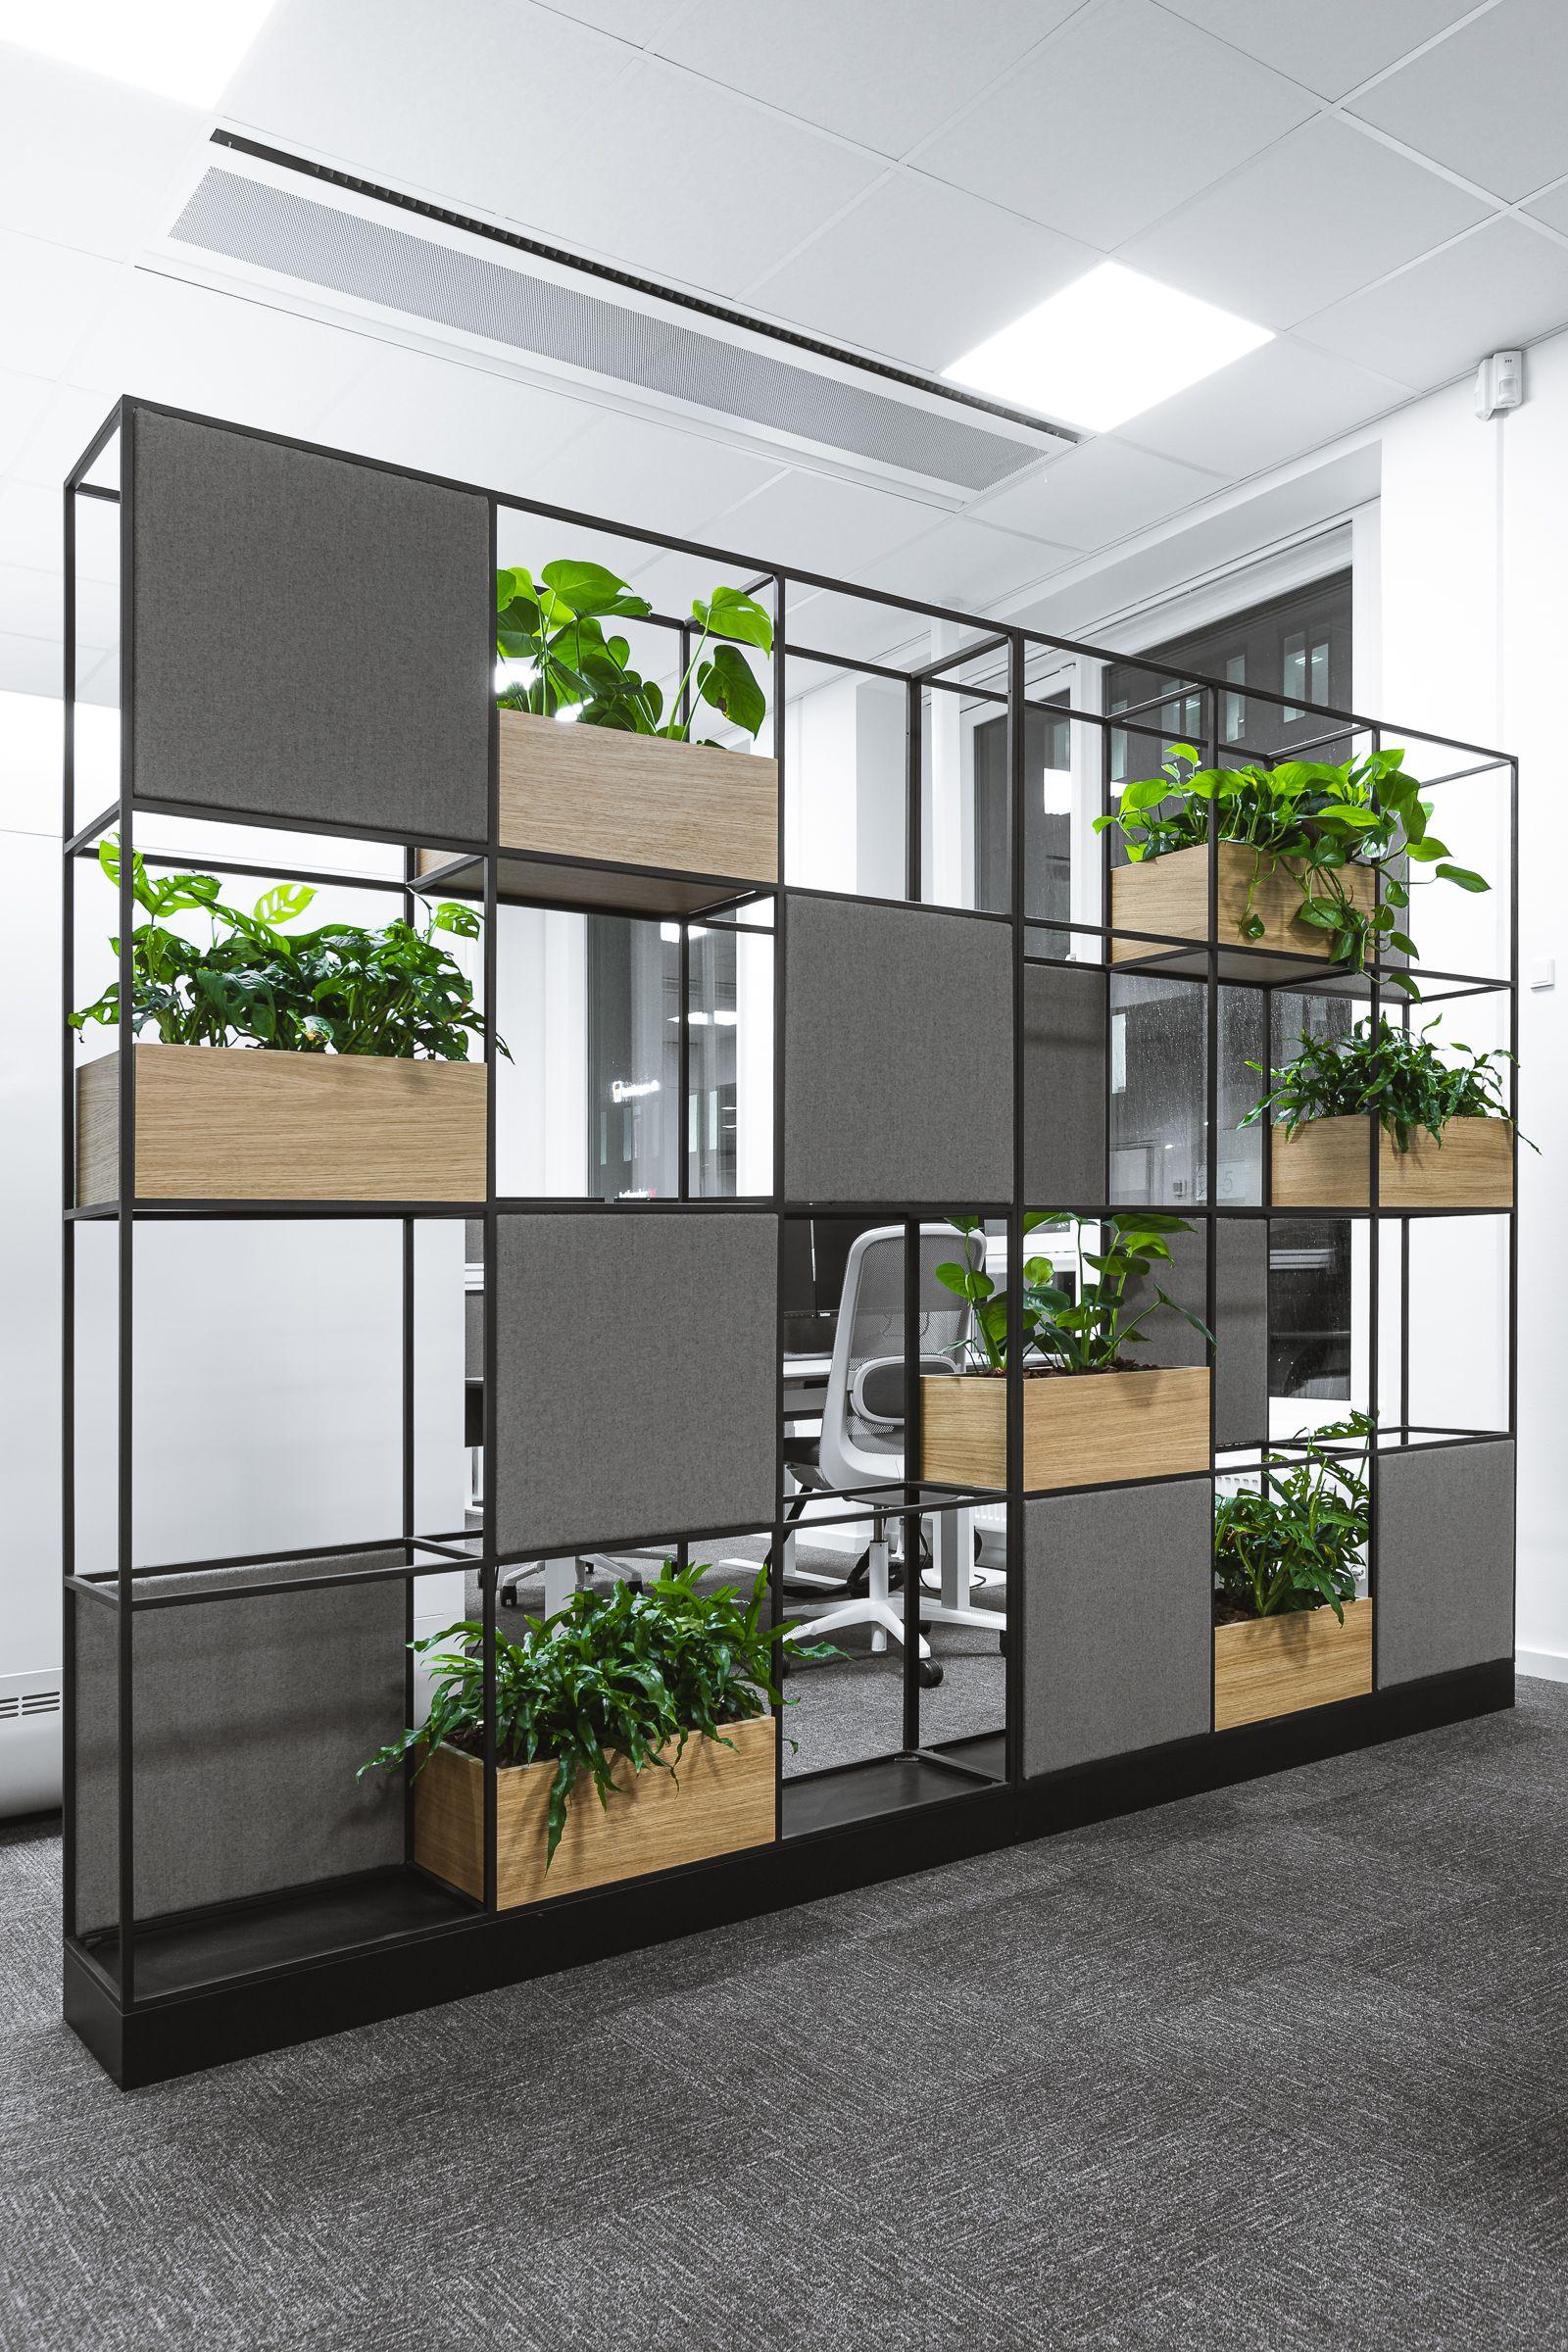 A Large Danish Bank In 2020 Bank Interior Design Corporate Office Decor Office Interior Design